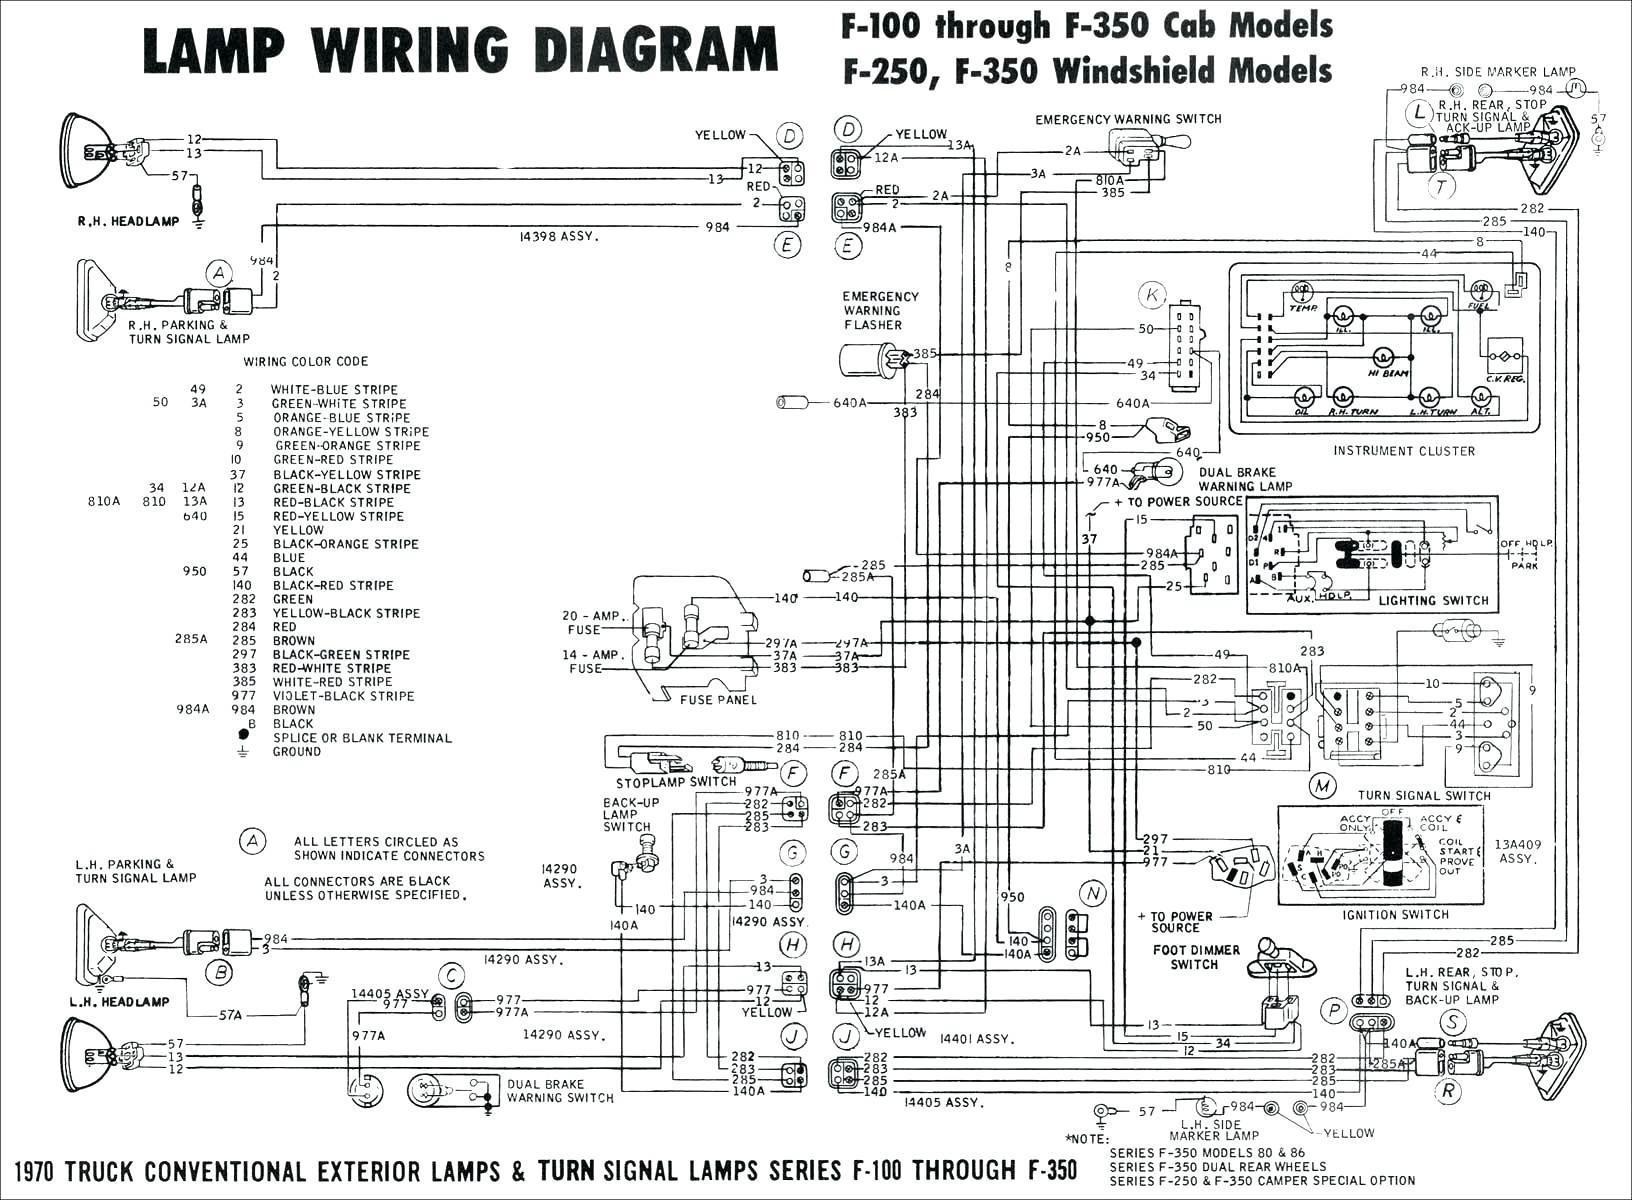 1999 jeep grand cherokee infinity stereo wiring diagram fresh